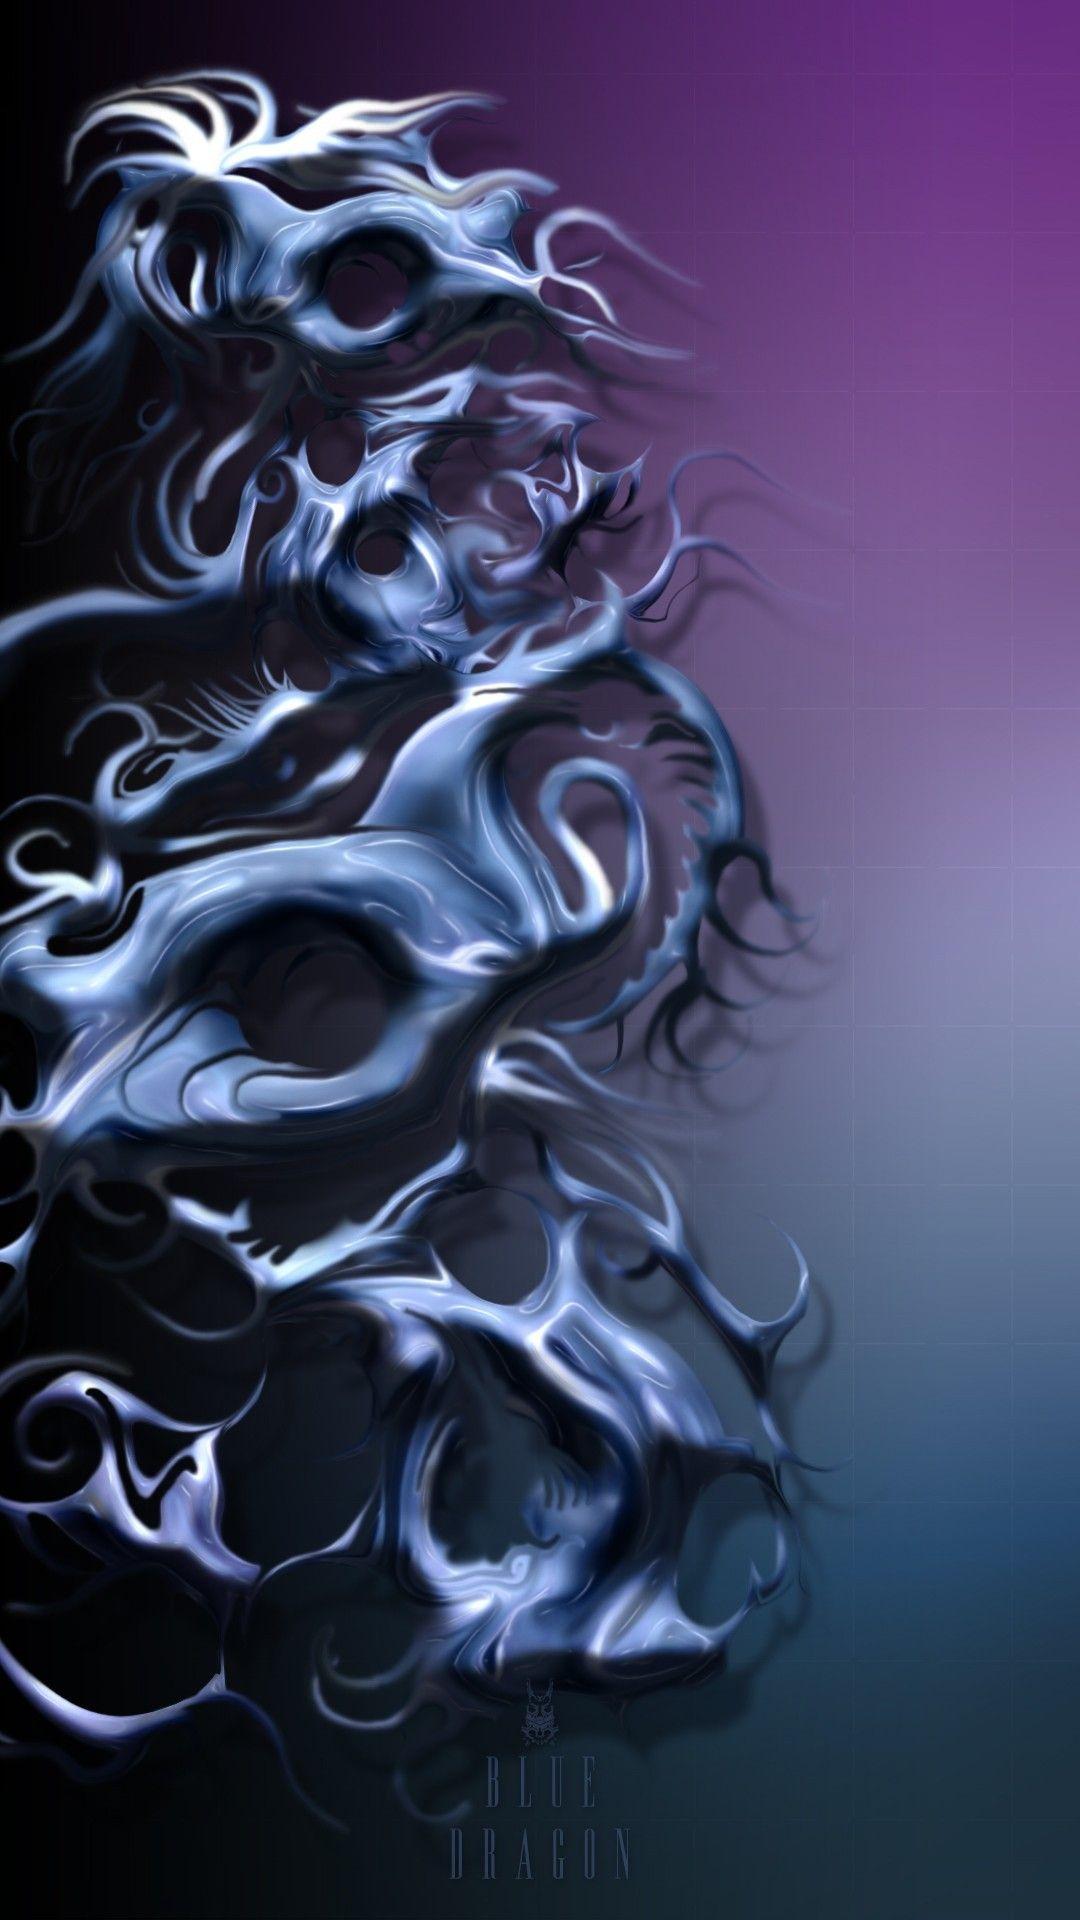 Dragons Wallpaper LG Cell